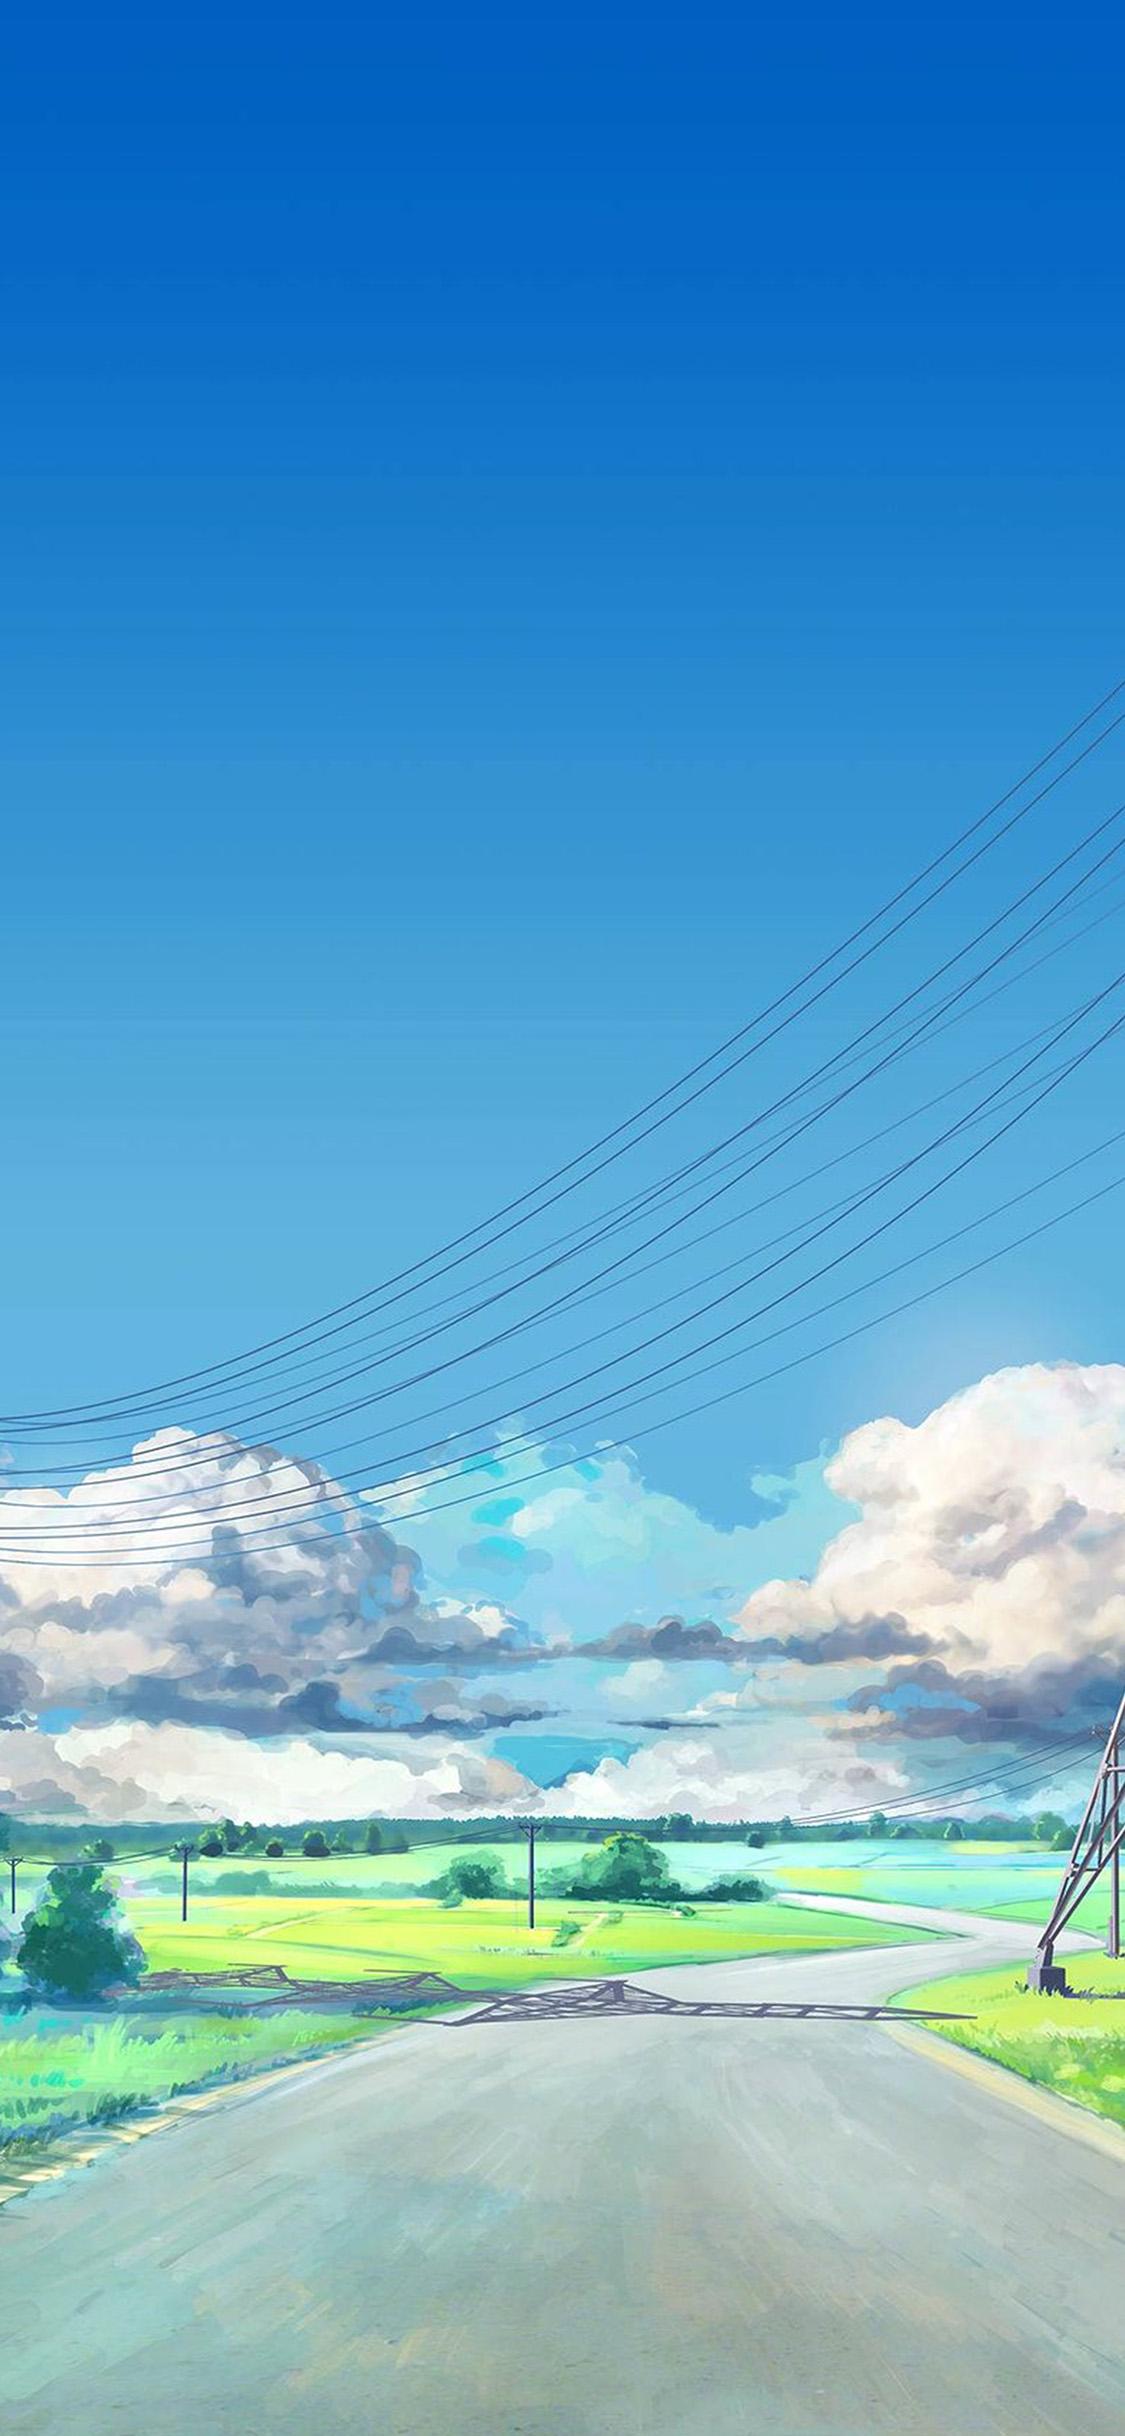 Sunny Sky Arsenic Art Illustration Iphone Wallpapers Free